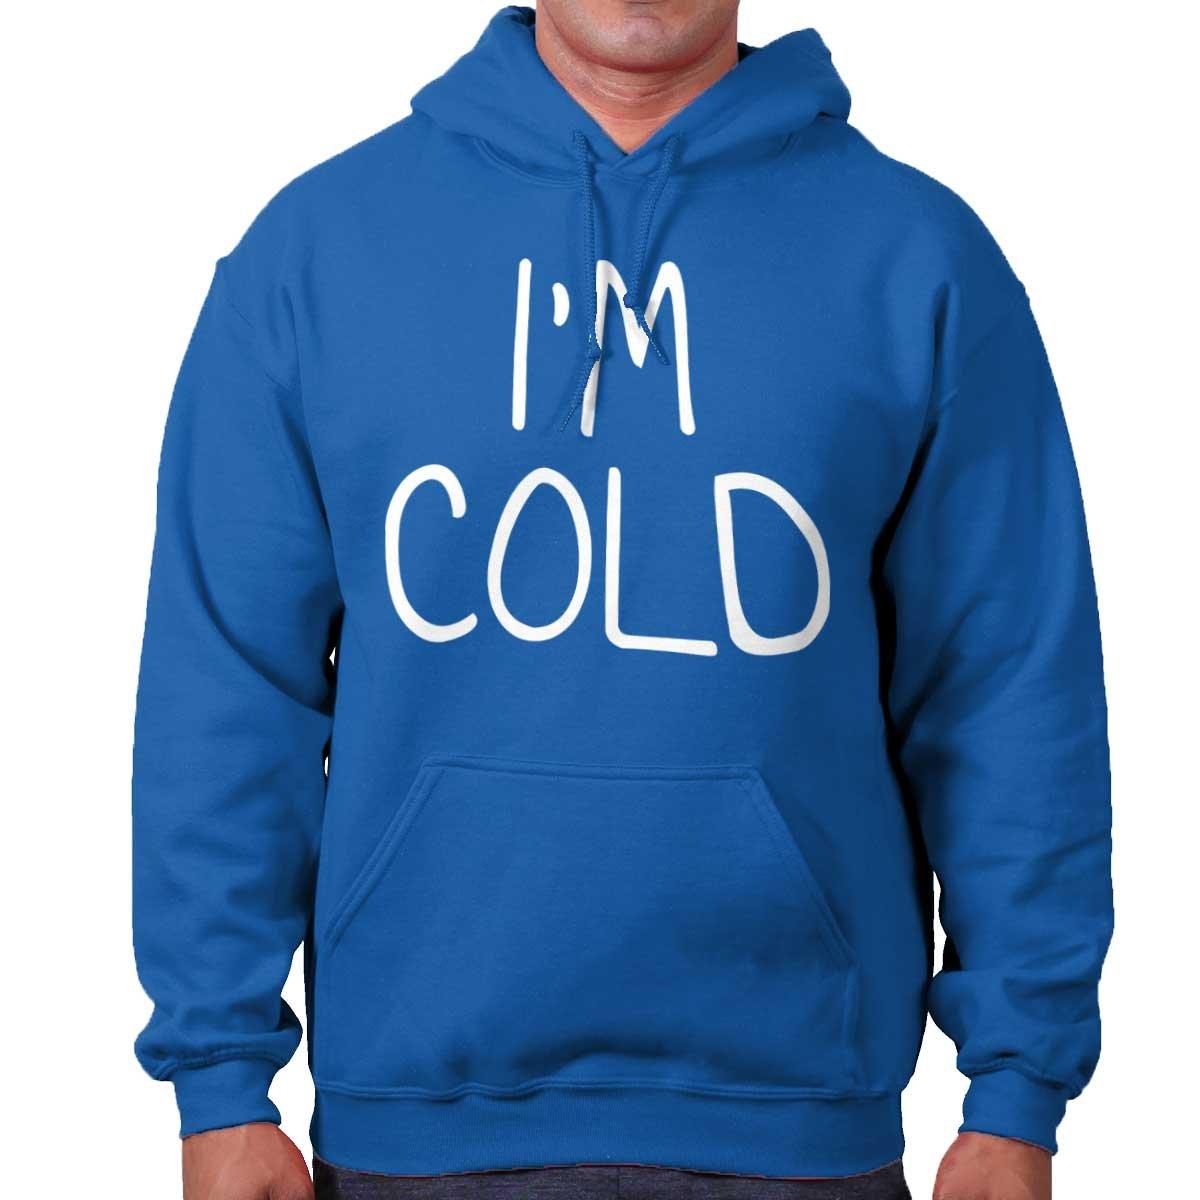 Im Cold Cute Shirt Funny Gift Cool Christmas Santa Claus Cute Hoodie Sweatshirt